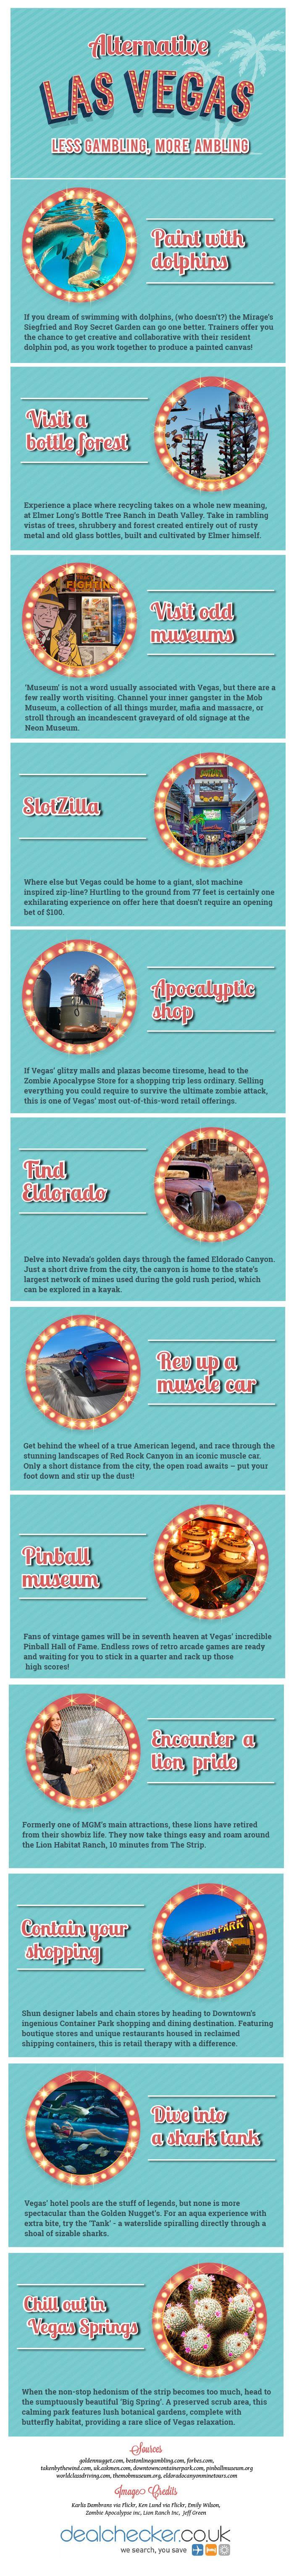 An Alternative Guide to Las Vegas